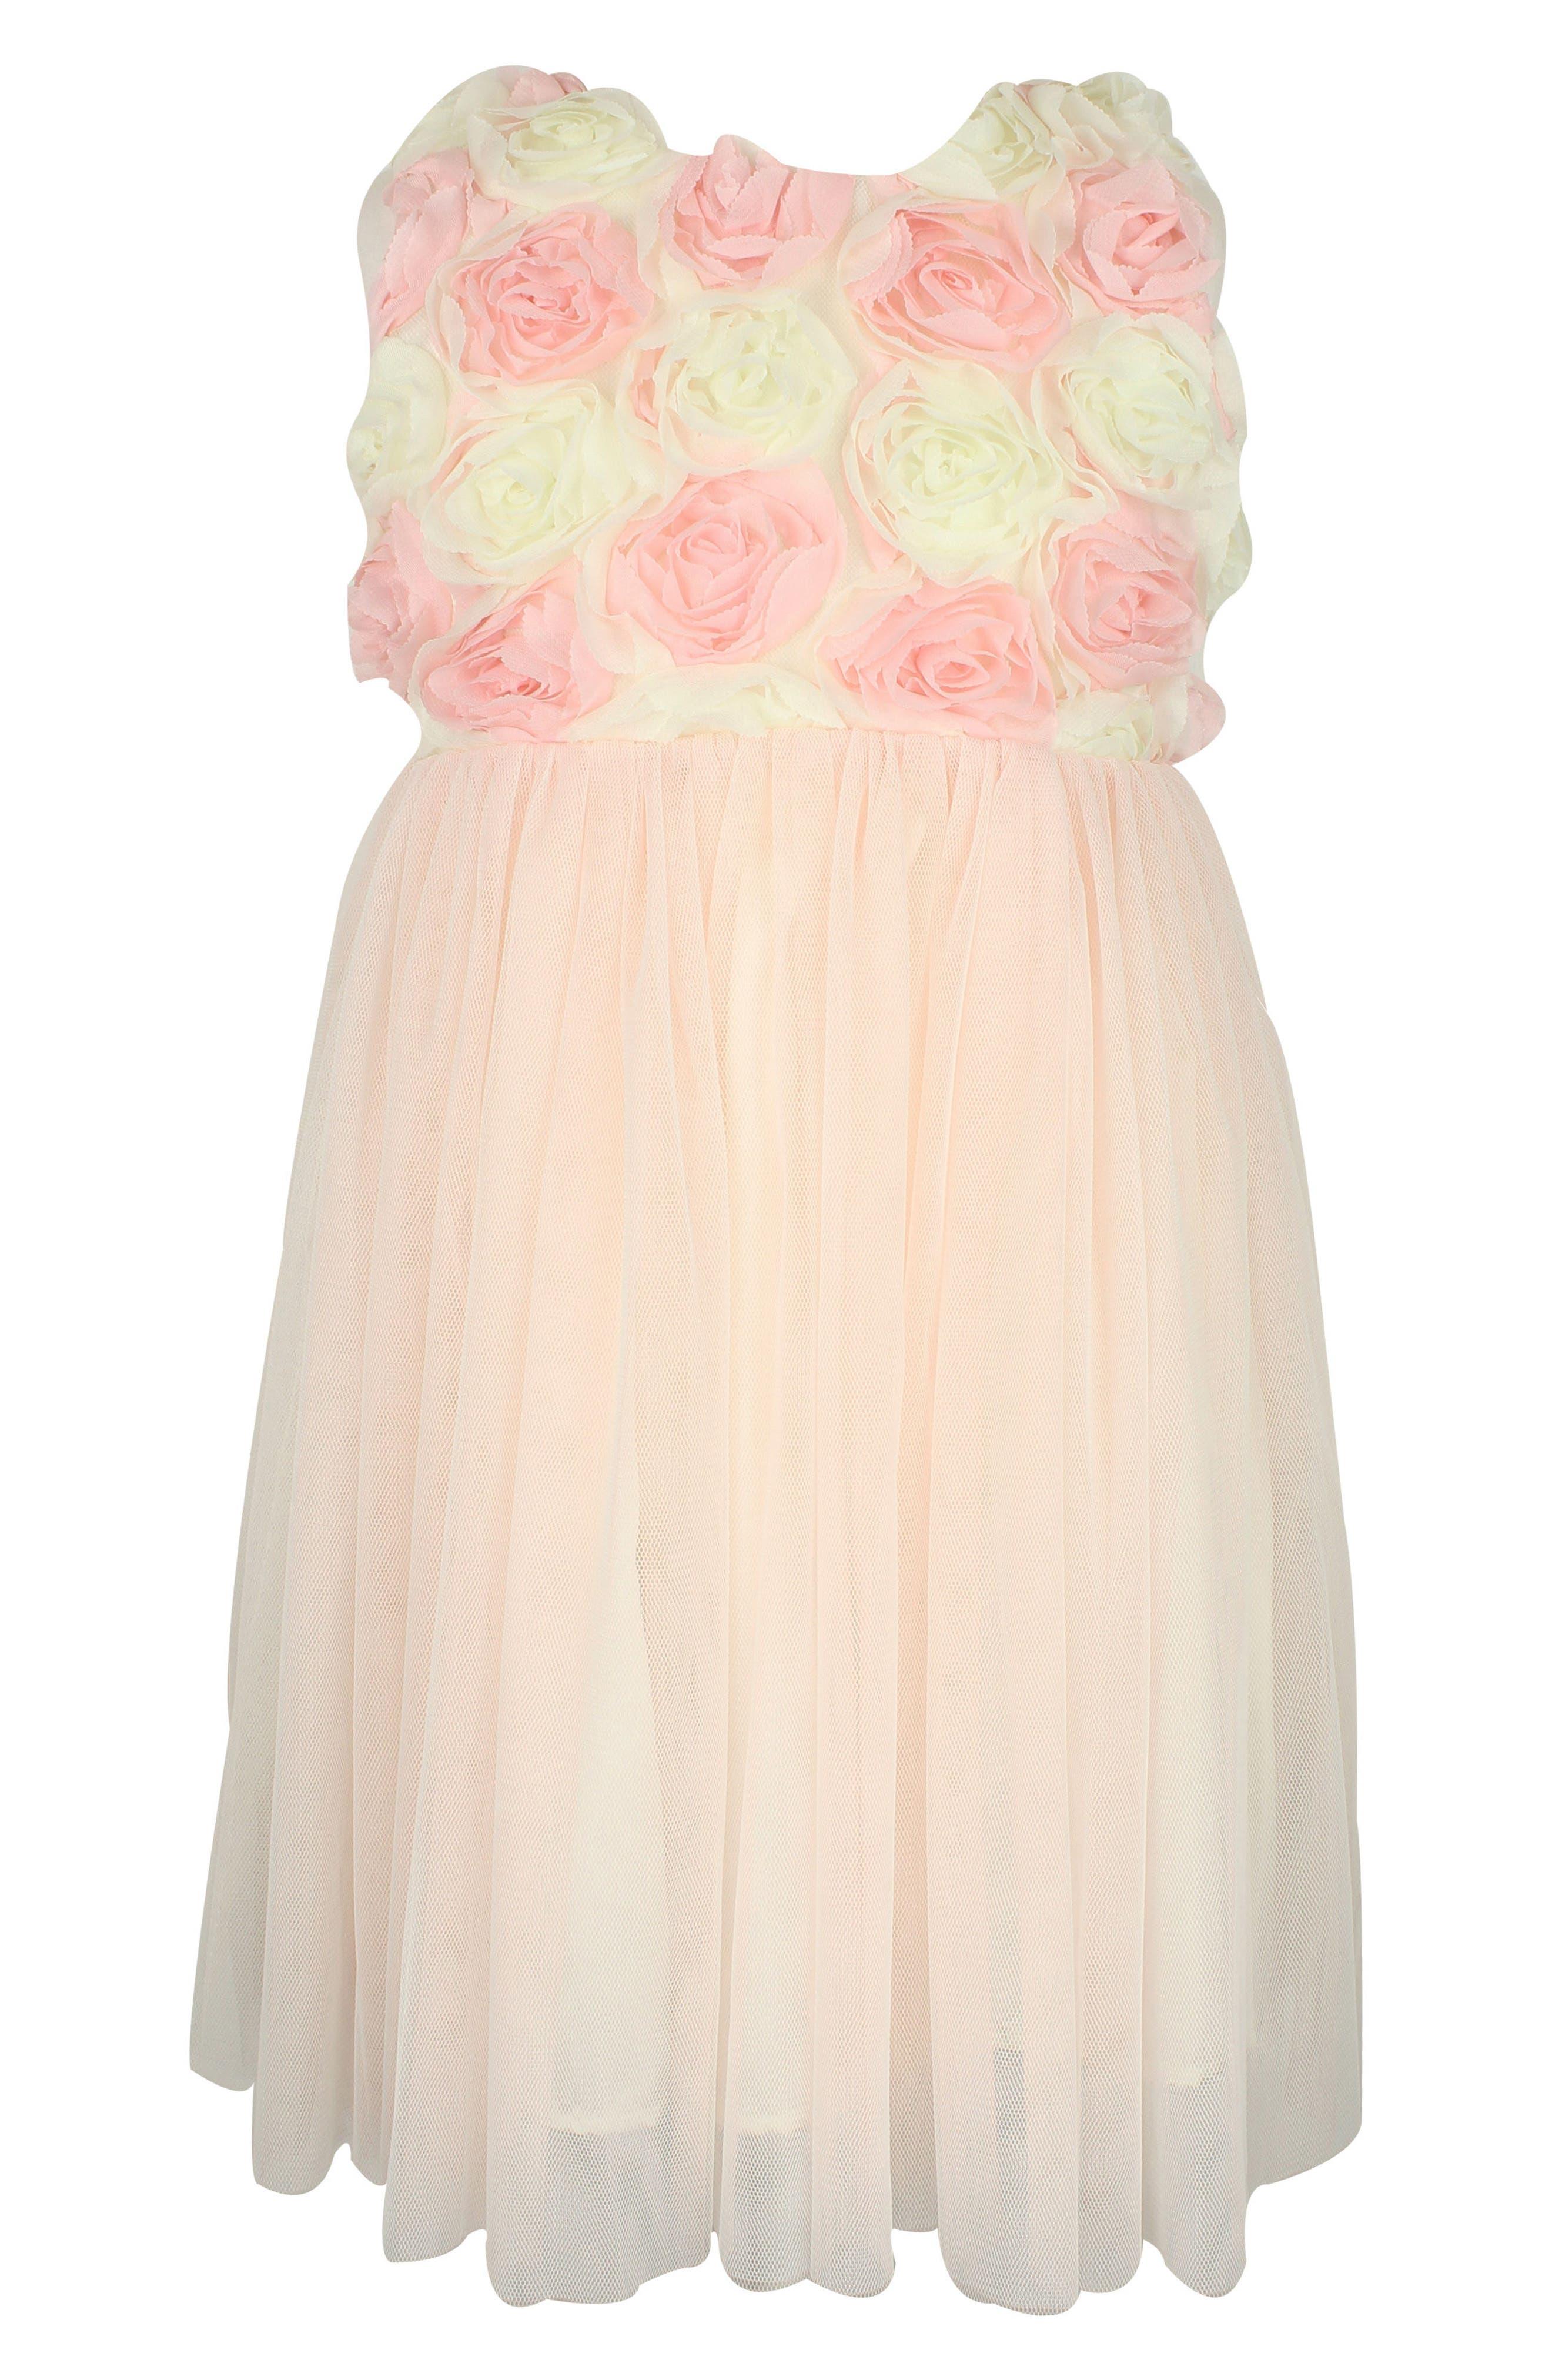 Rosette Tulle Dress,                             Main thumbnail 1, color,                             100